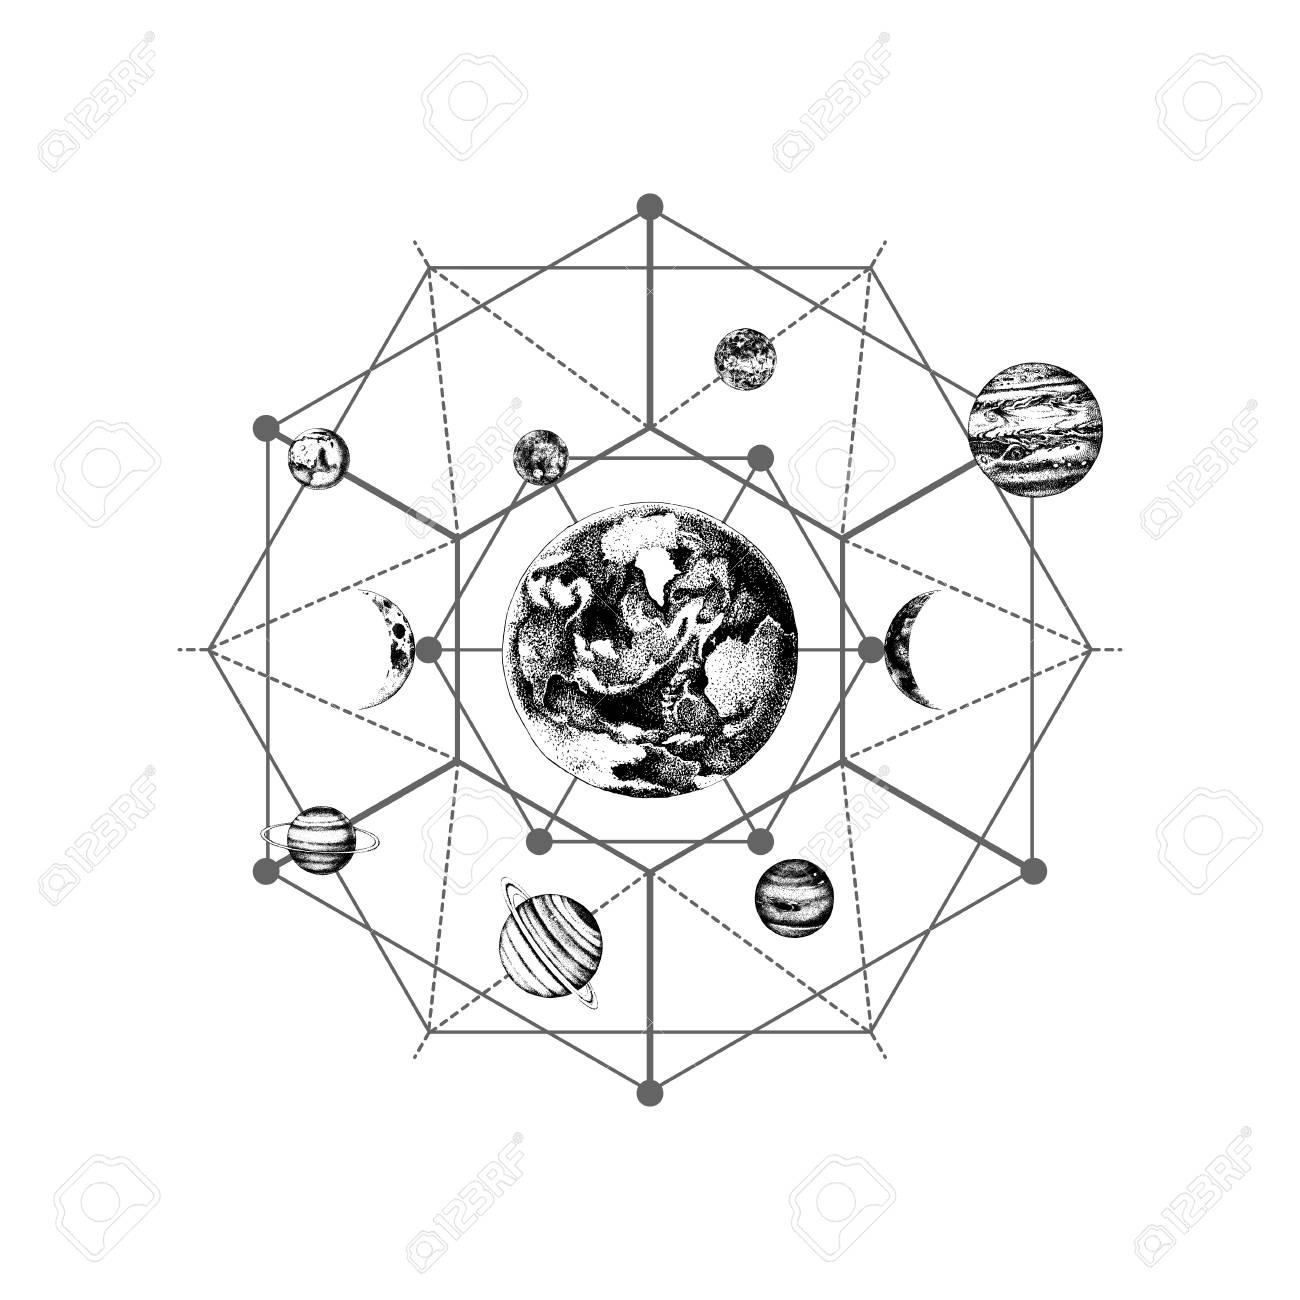 Solar system sacred geometry - 109807625